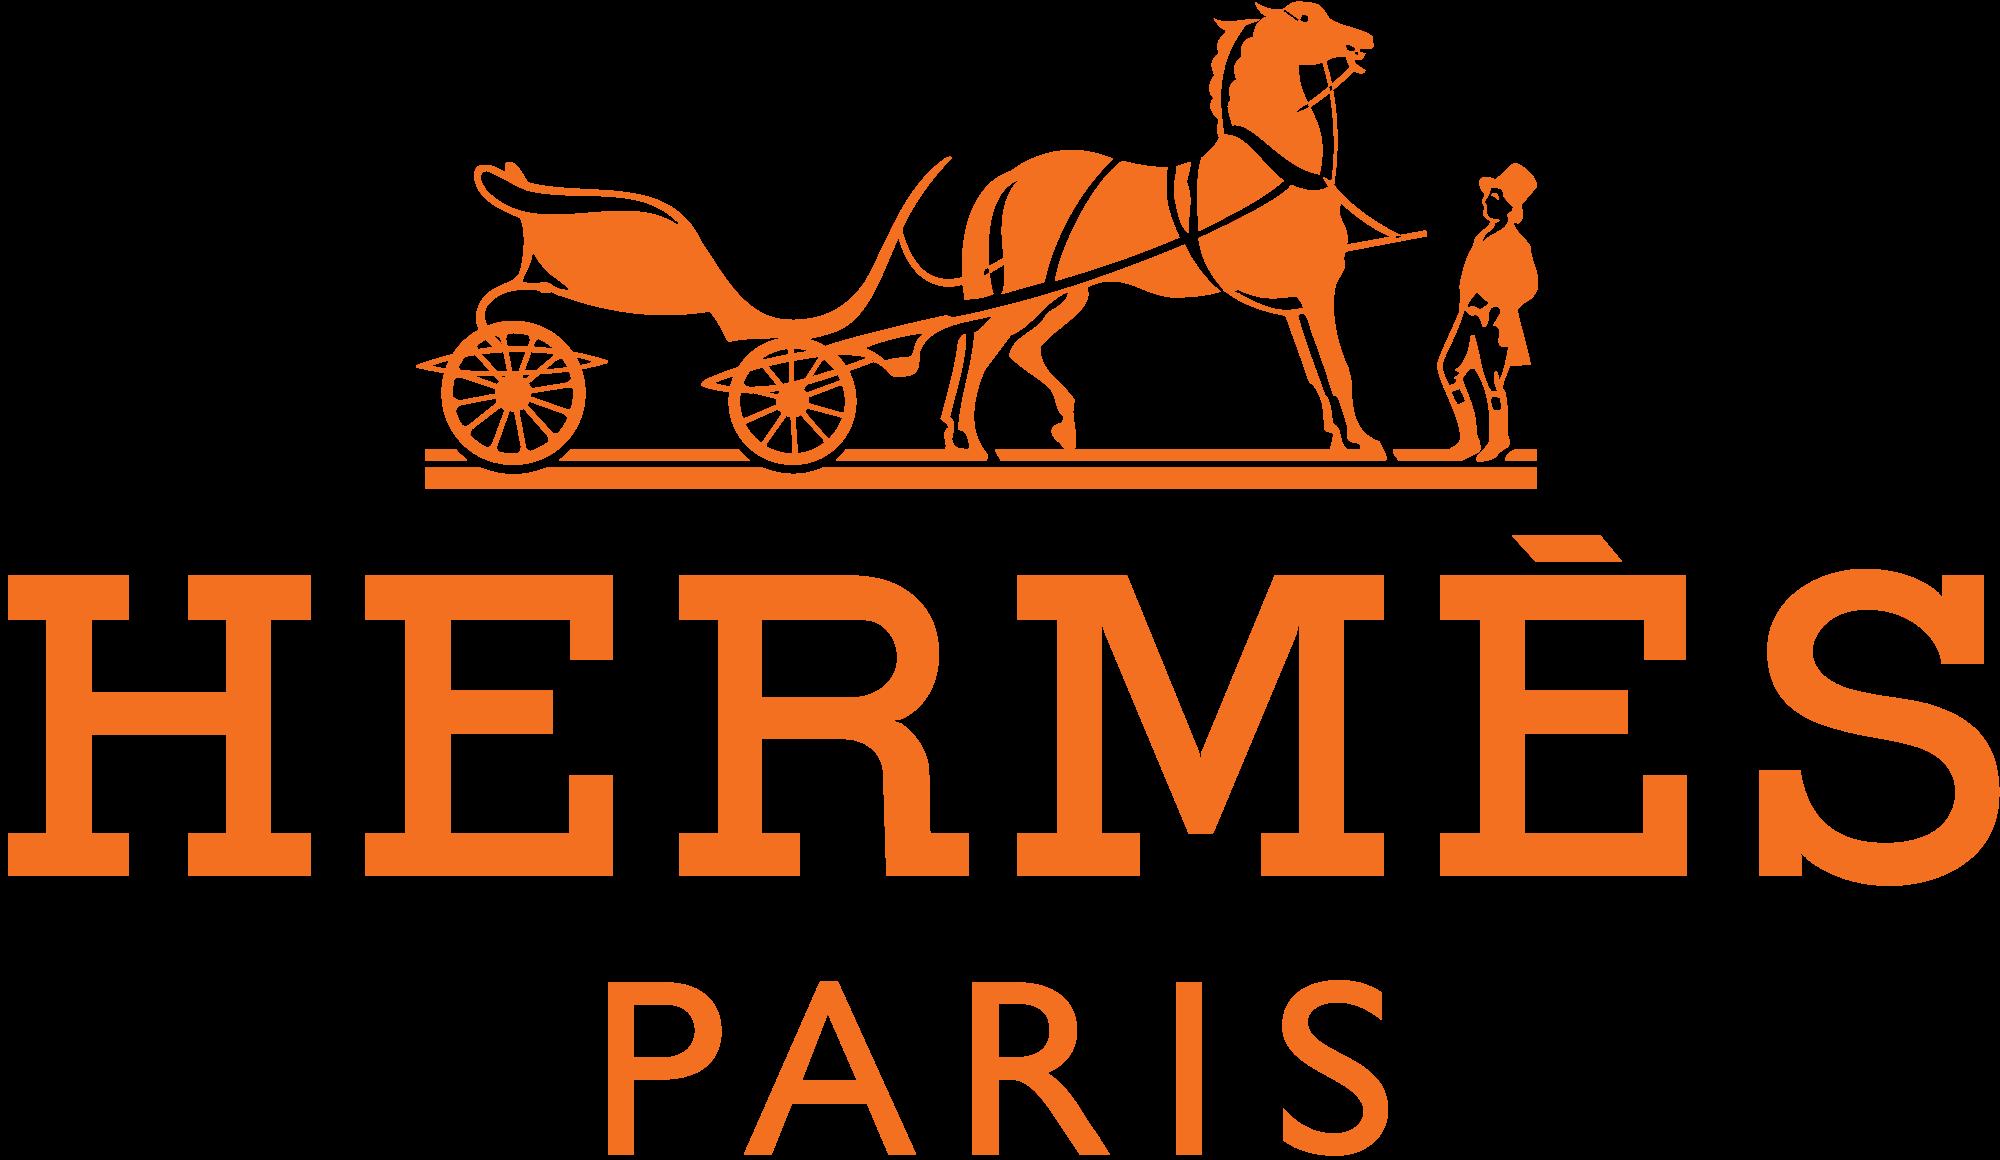 Hermes PNG